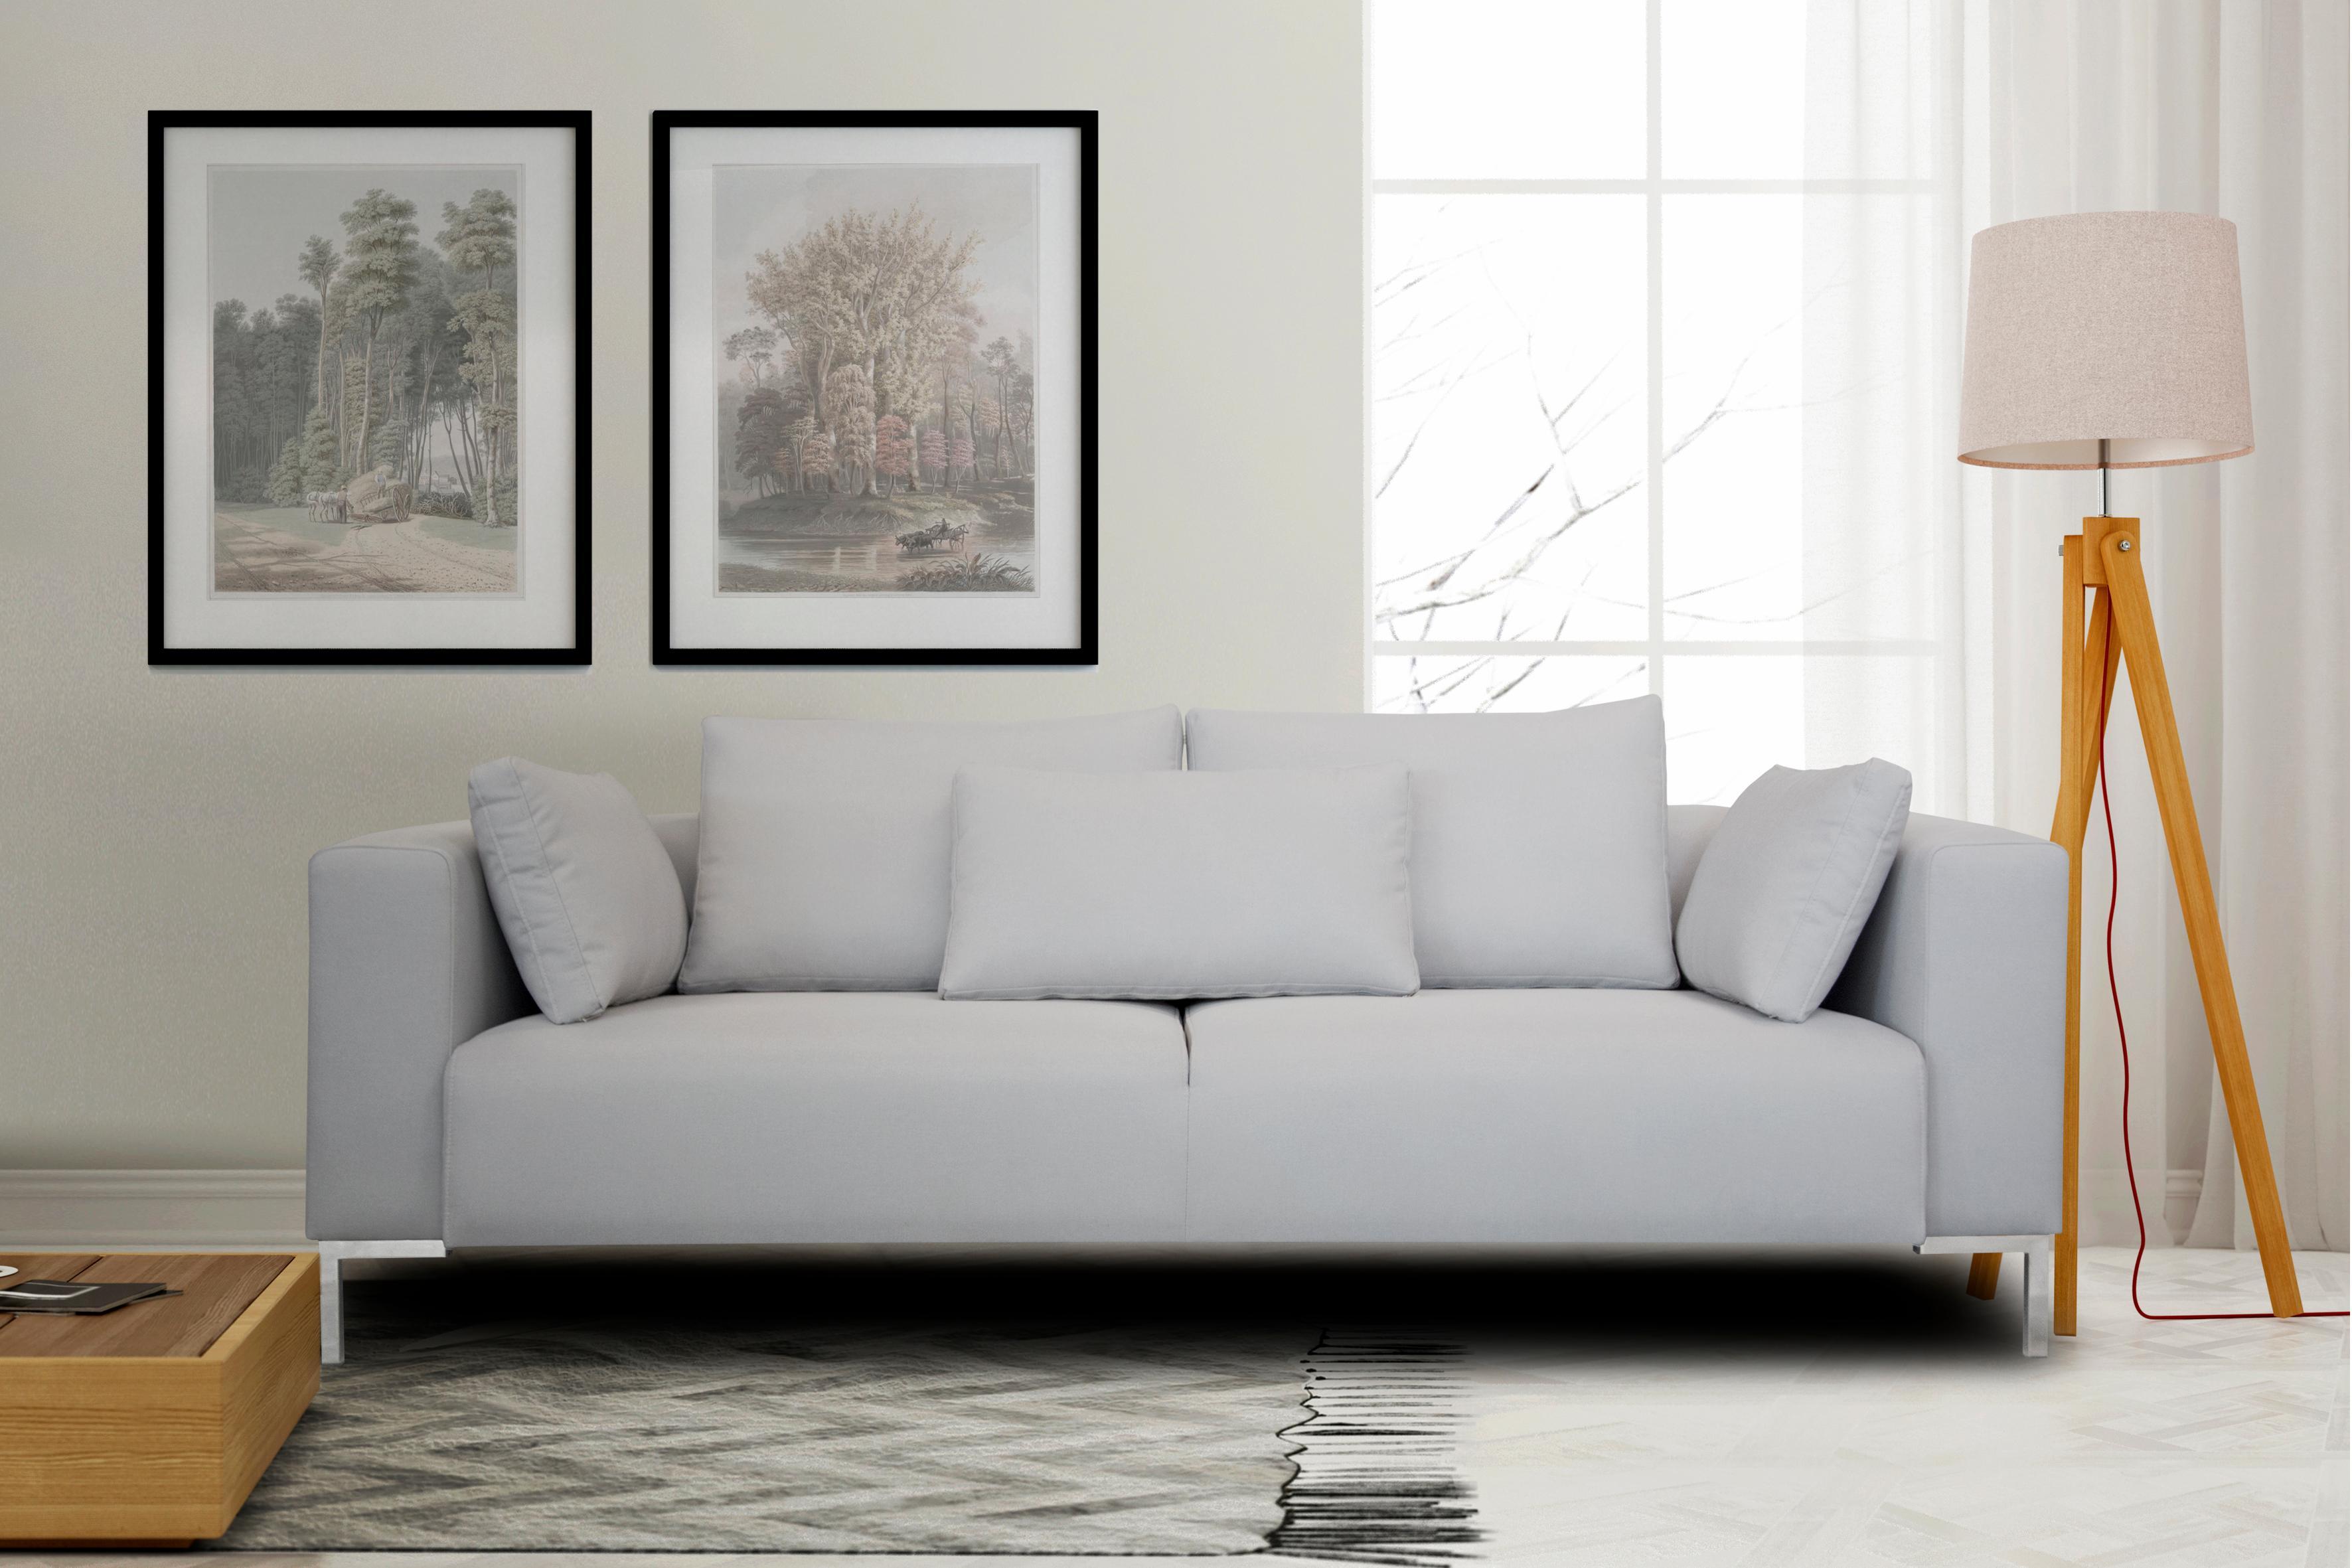 INOSIGN 3-Sitzer »Perle« in tollem Design, Metalbeine, Zierkissen